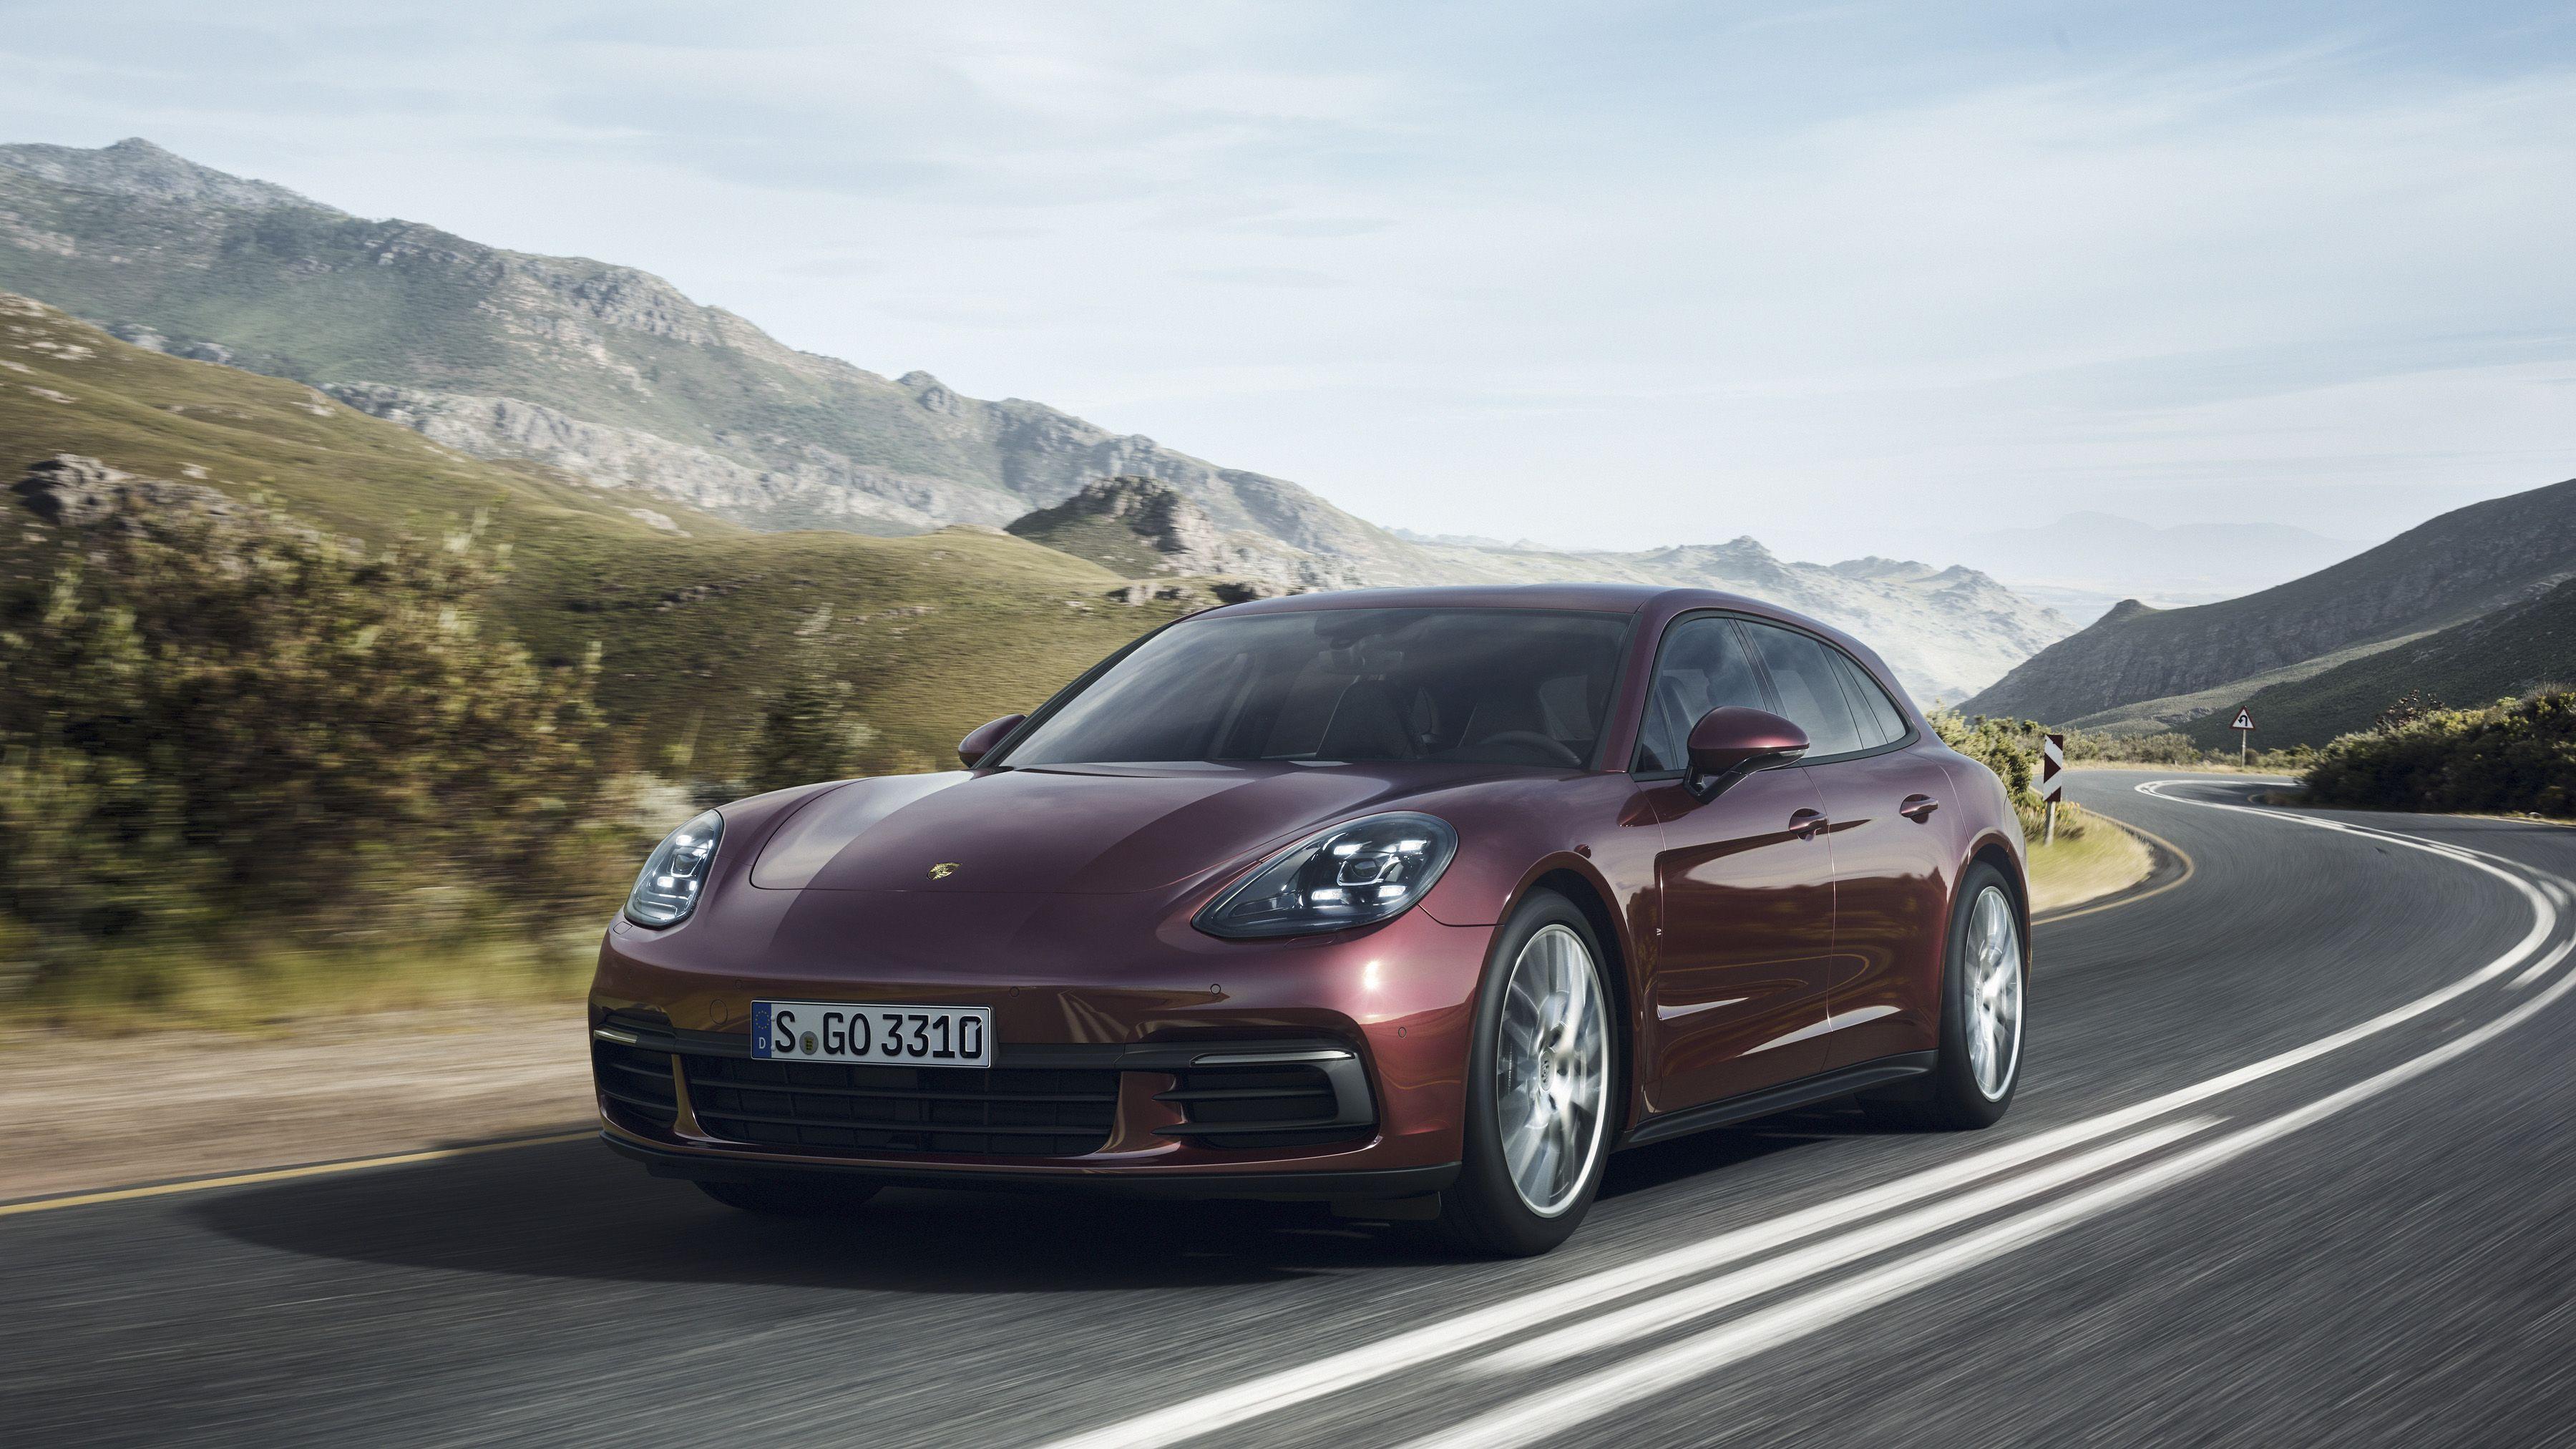 2020 Porsche Panamera Sport Turismo Review, Pricing, and